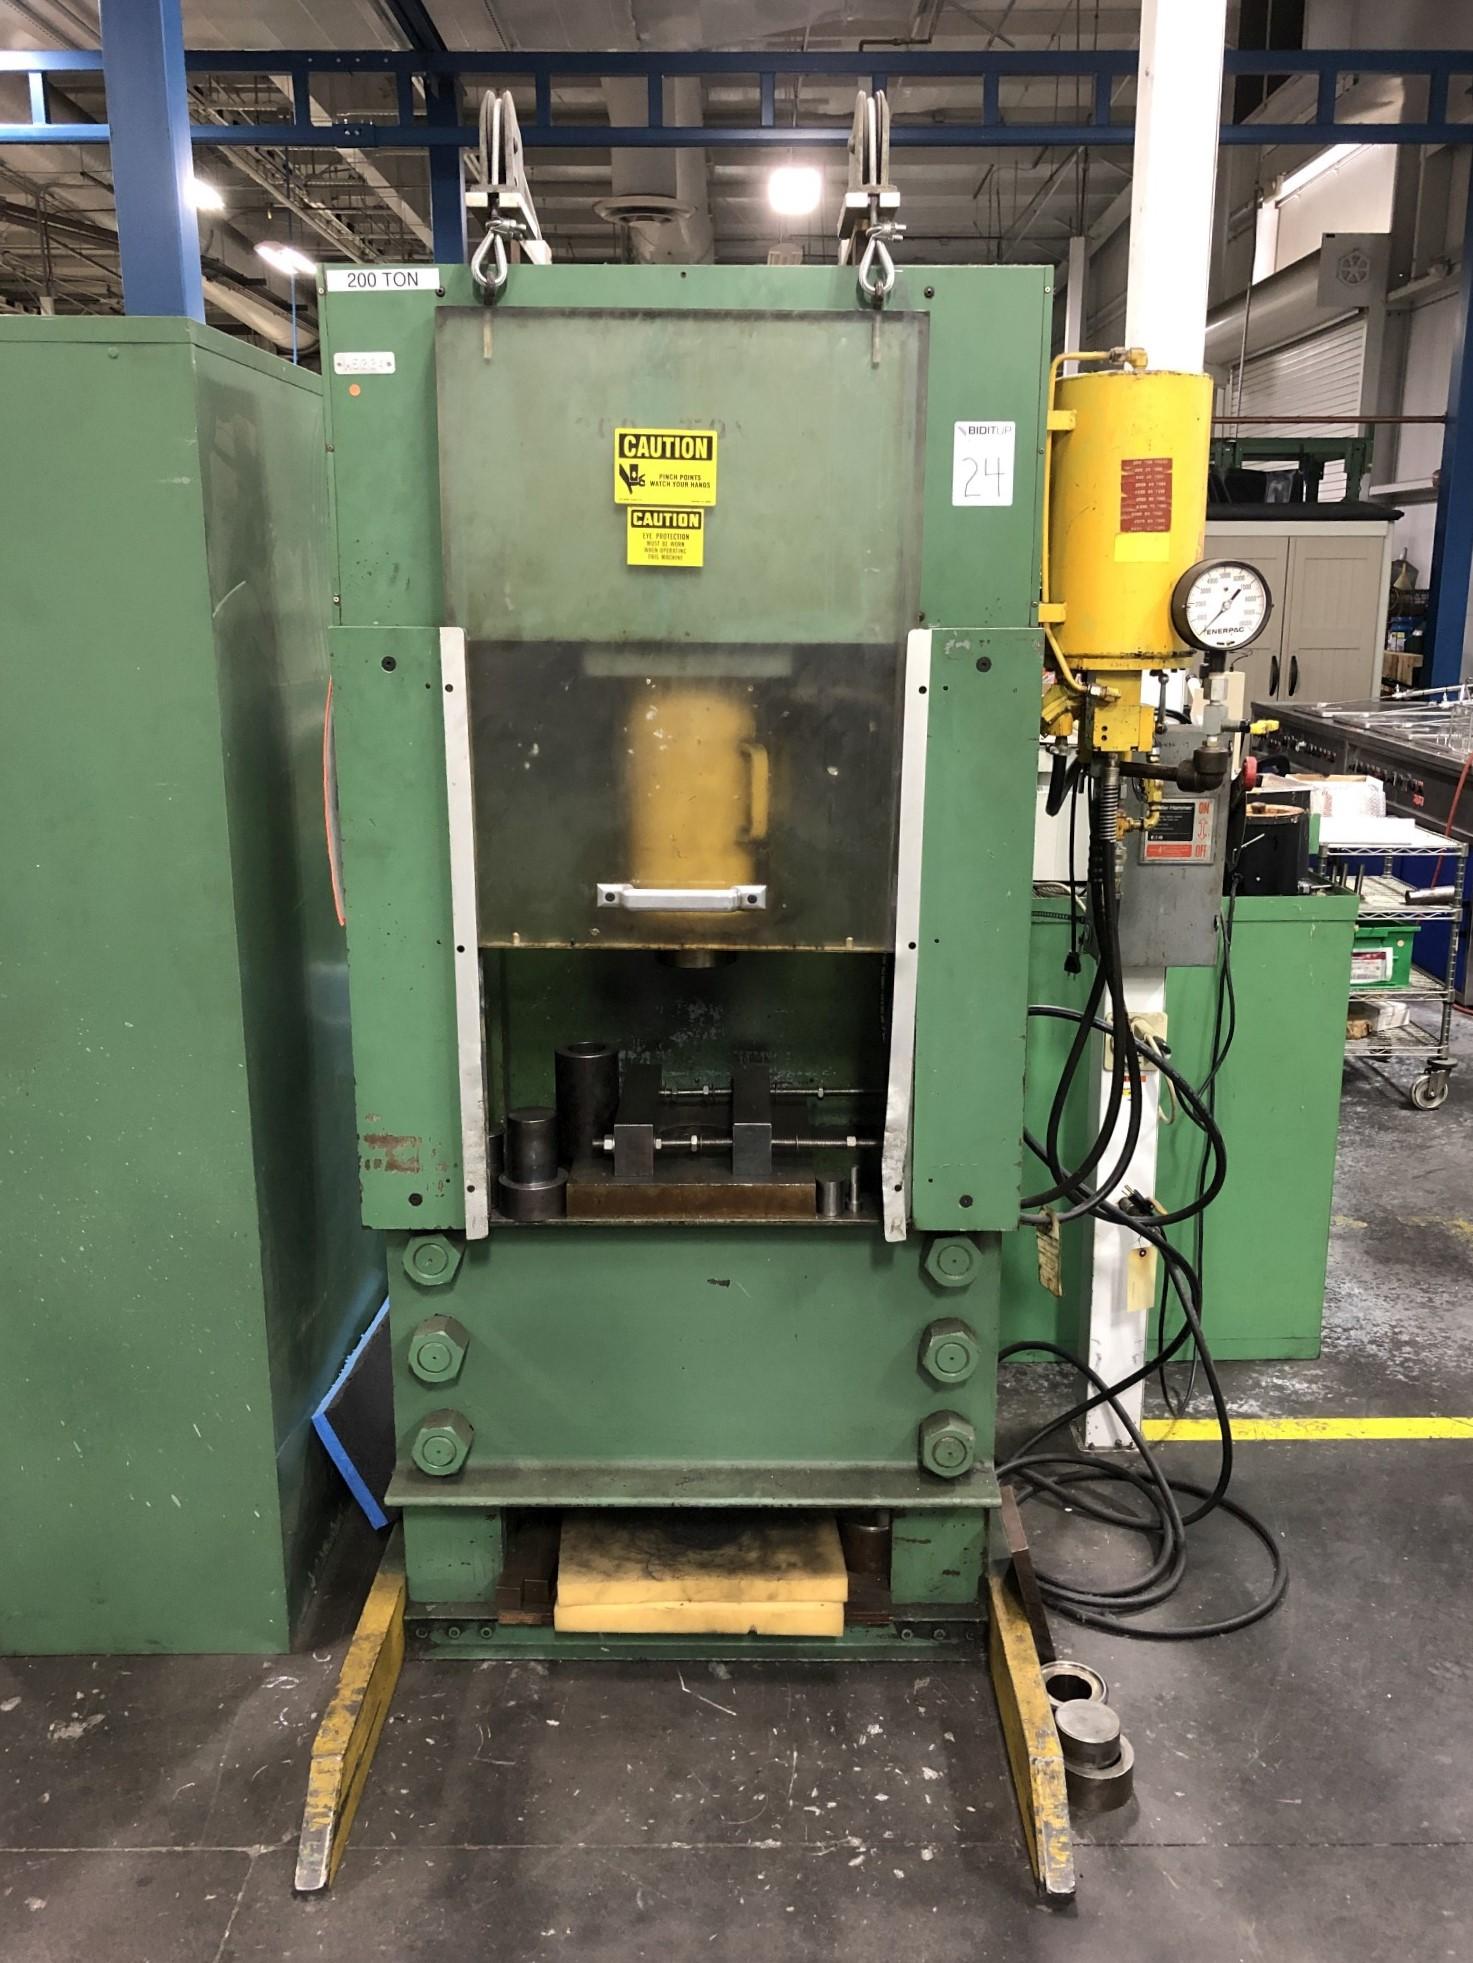 Dake 200 Ton Hydraulic Press